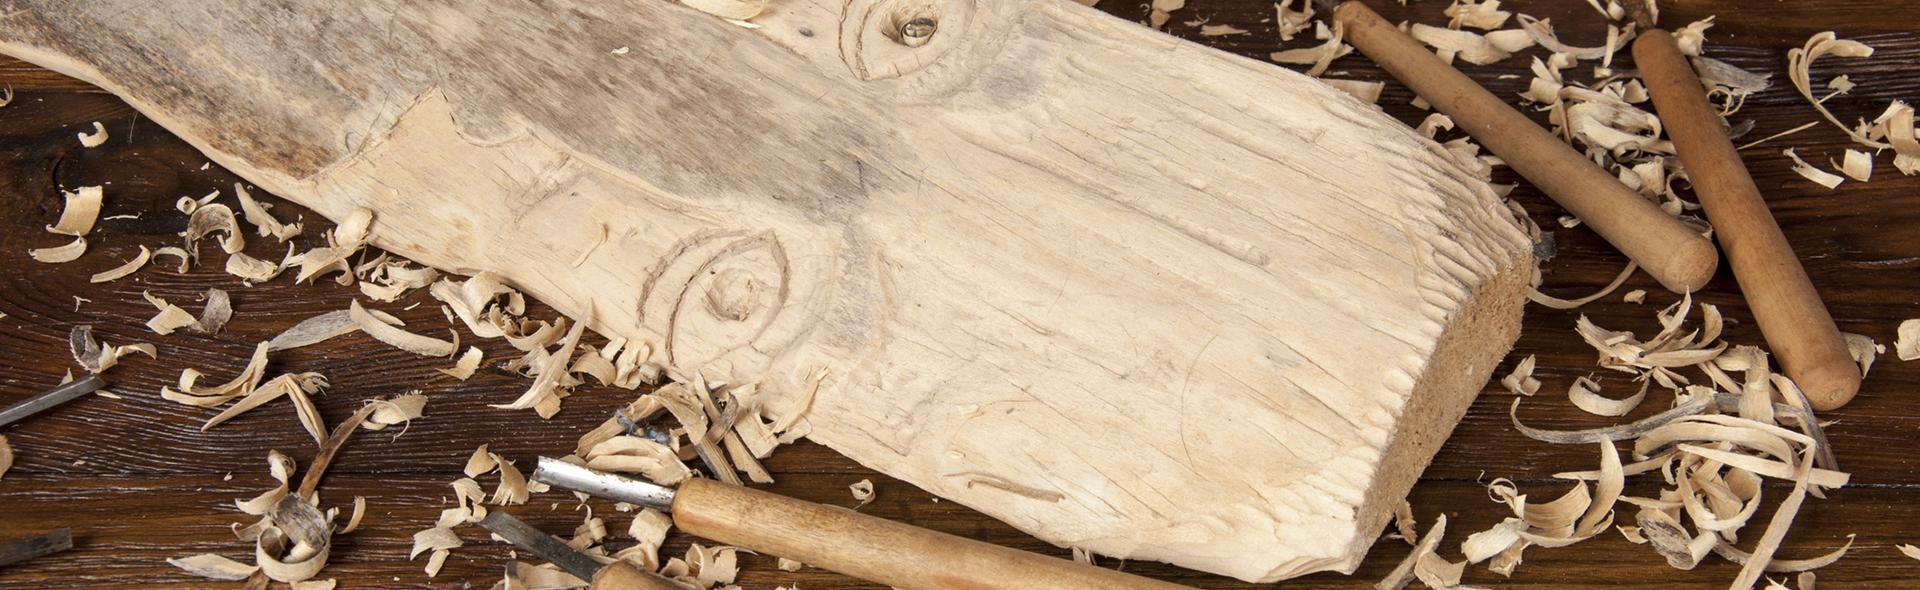 Holzwürfel